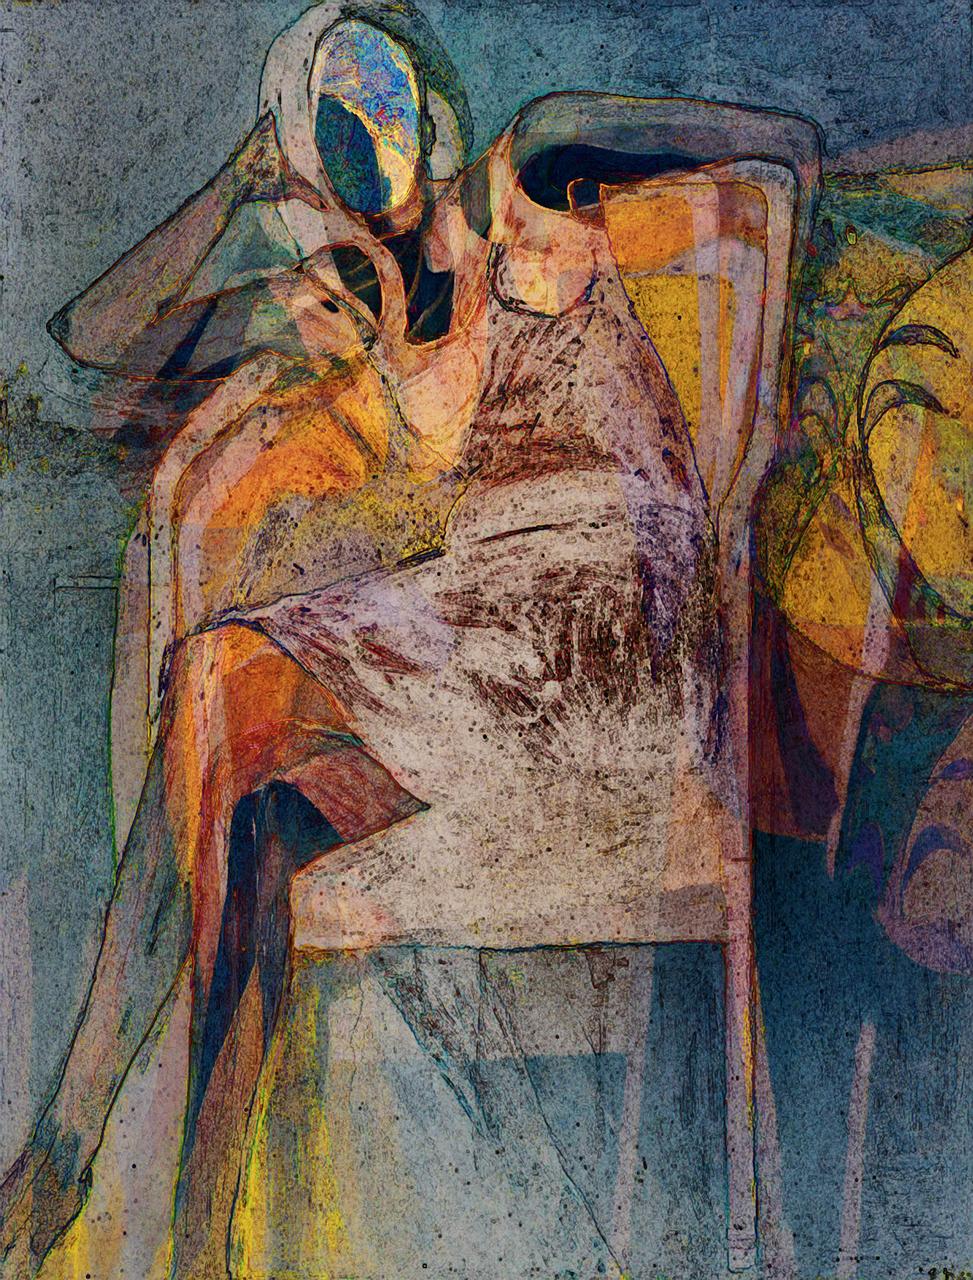 Diebenkorn, Richard (Seated Woman, 1967)